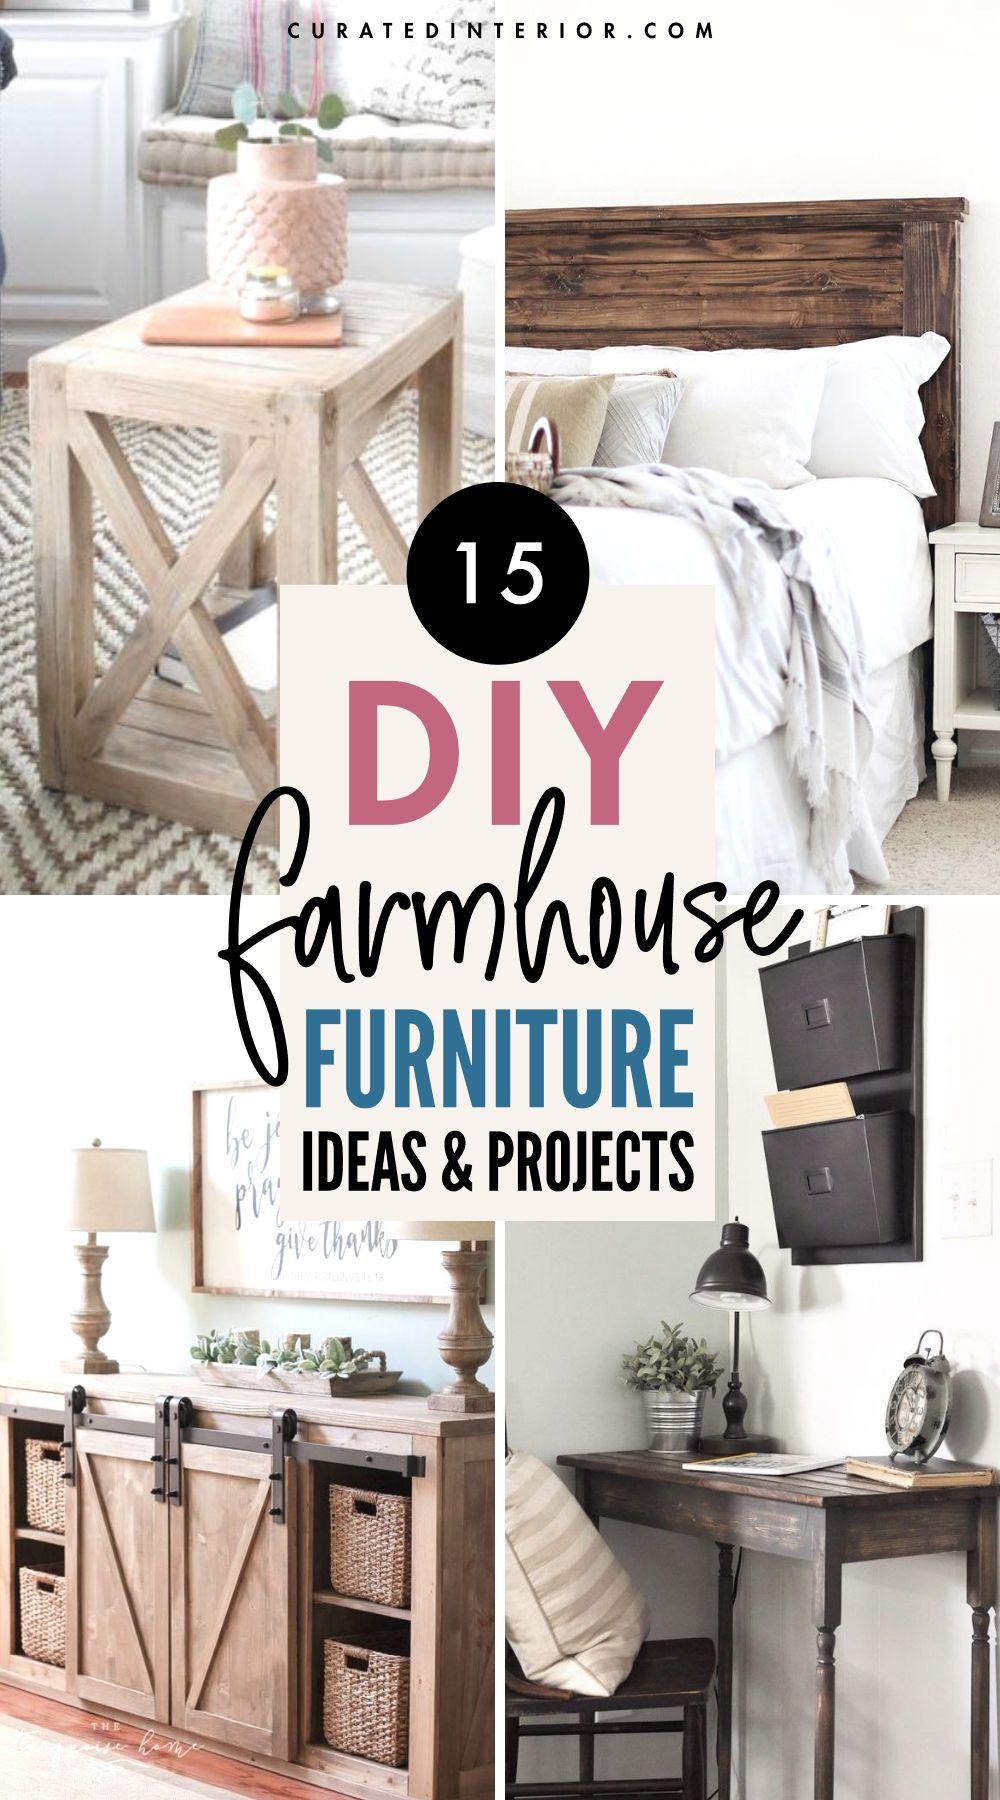 15 DIY Farmhouse Furniture Ideas